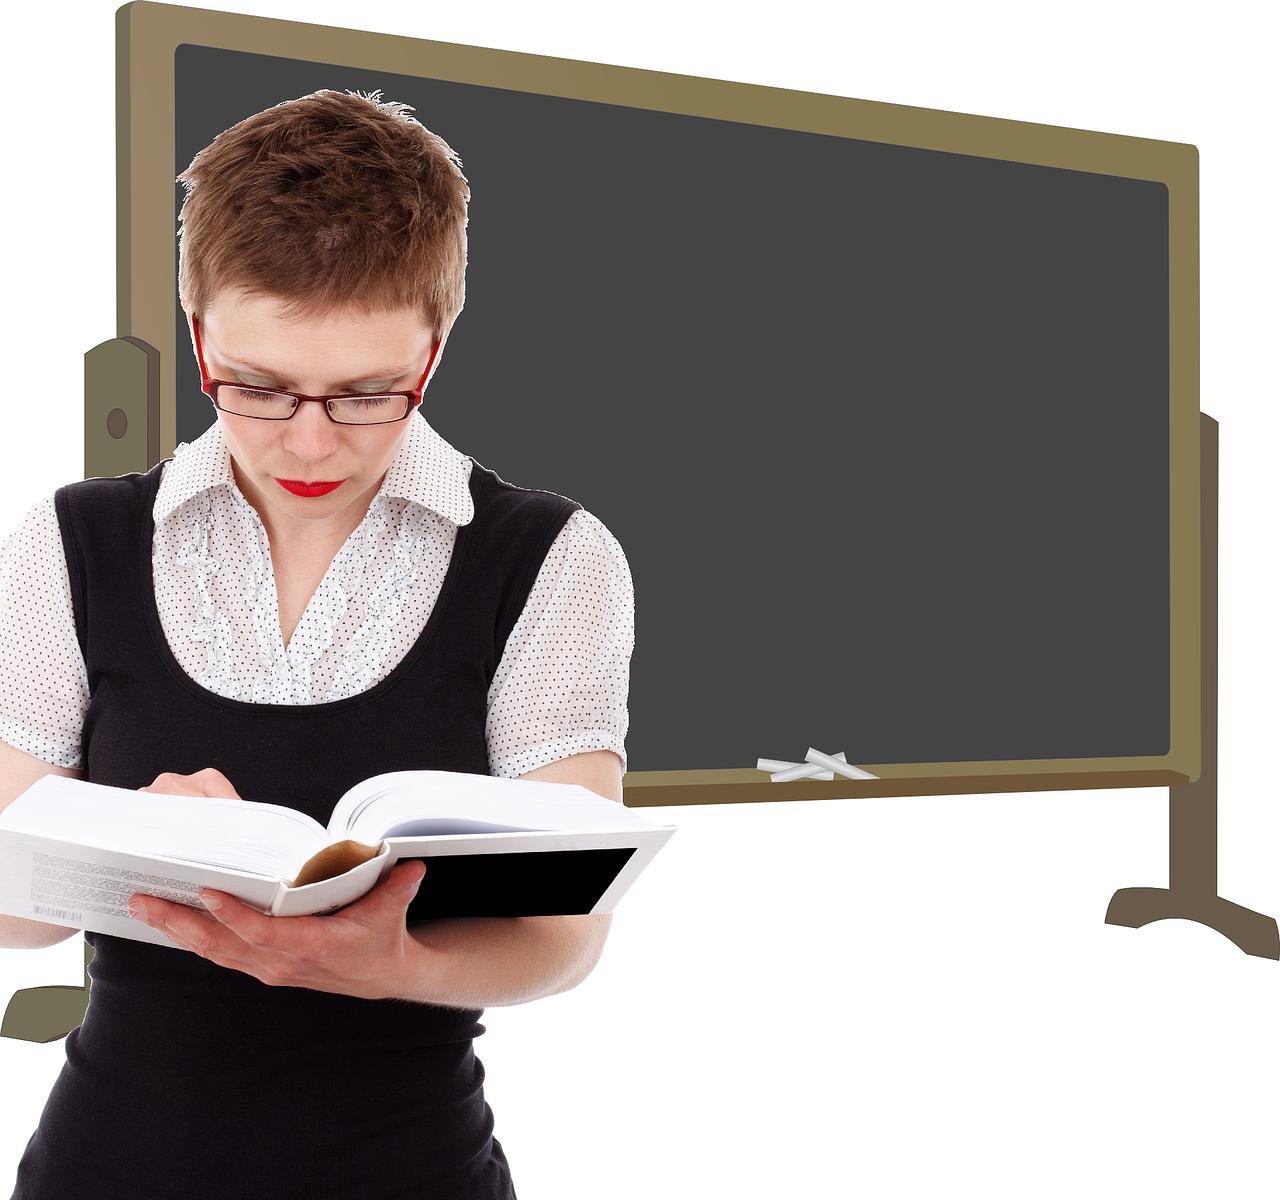 NotizieScuola.it - AAA Insegnanti Cercasi